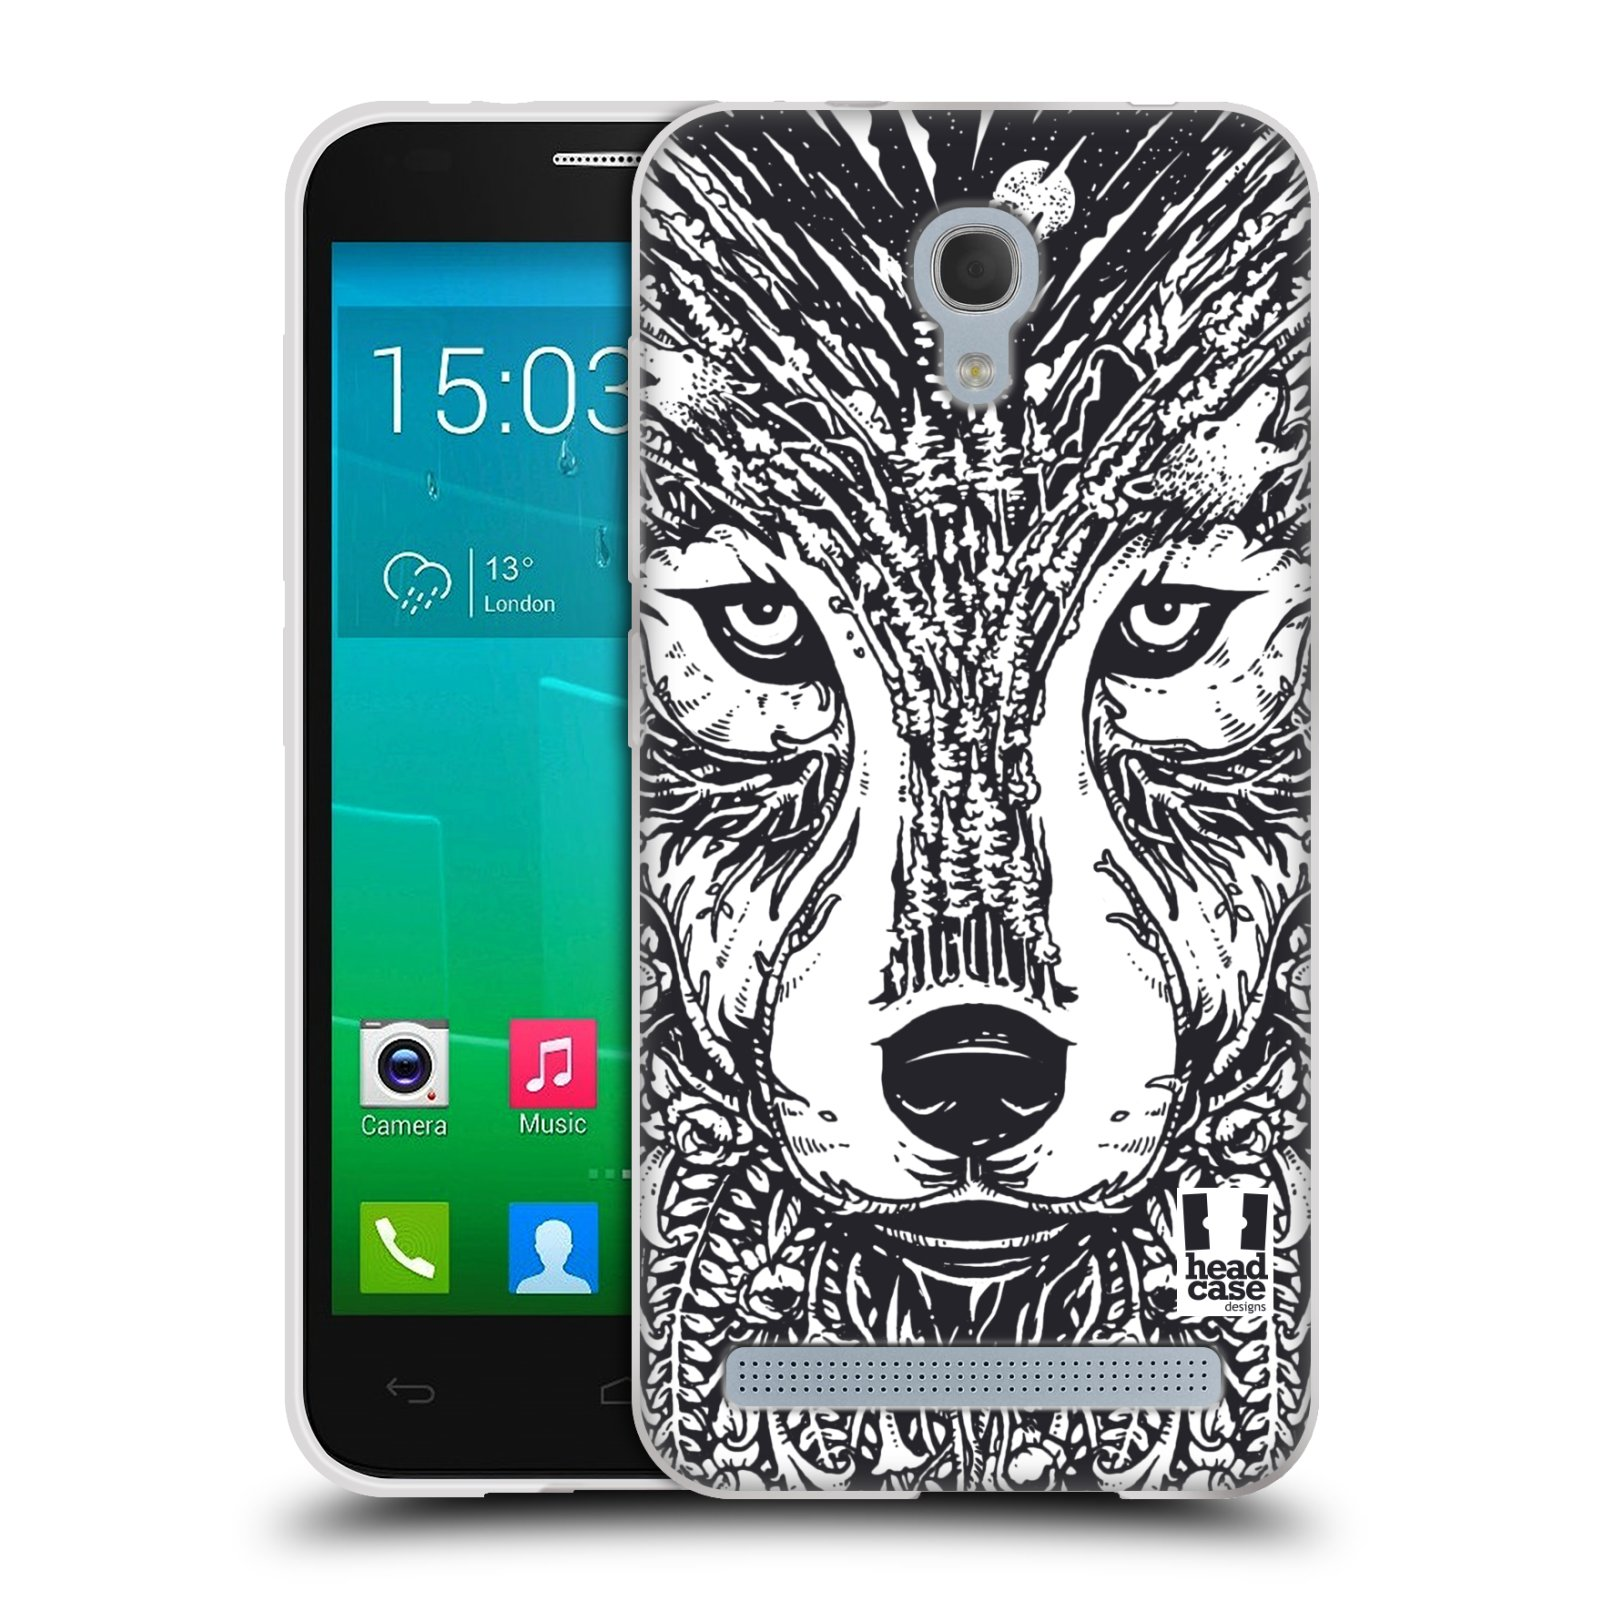 Silikonové pouzdro na mobil Alcatel One Touch Idol 2 Mini S 6036Y HEAD CASE DOODLE TVÁŘ VLK